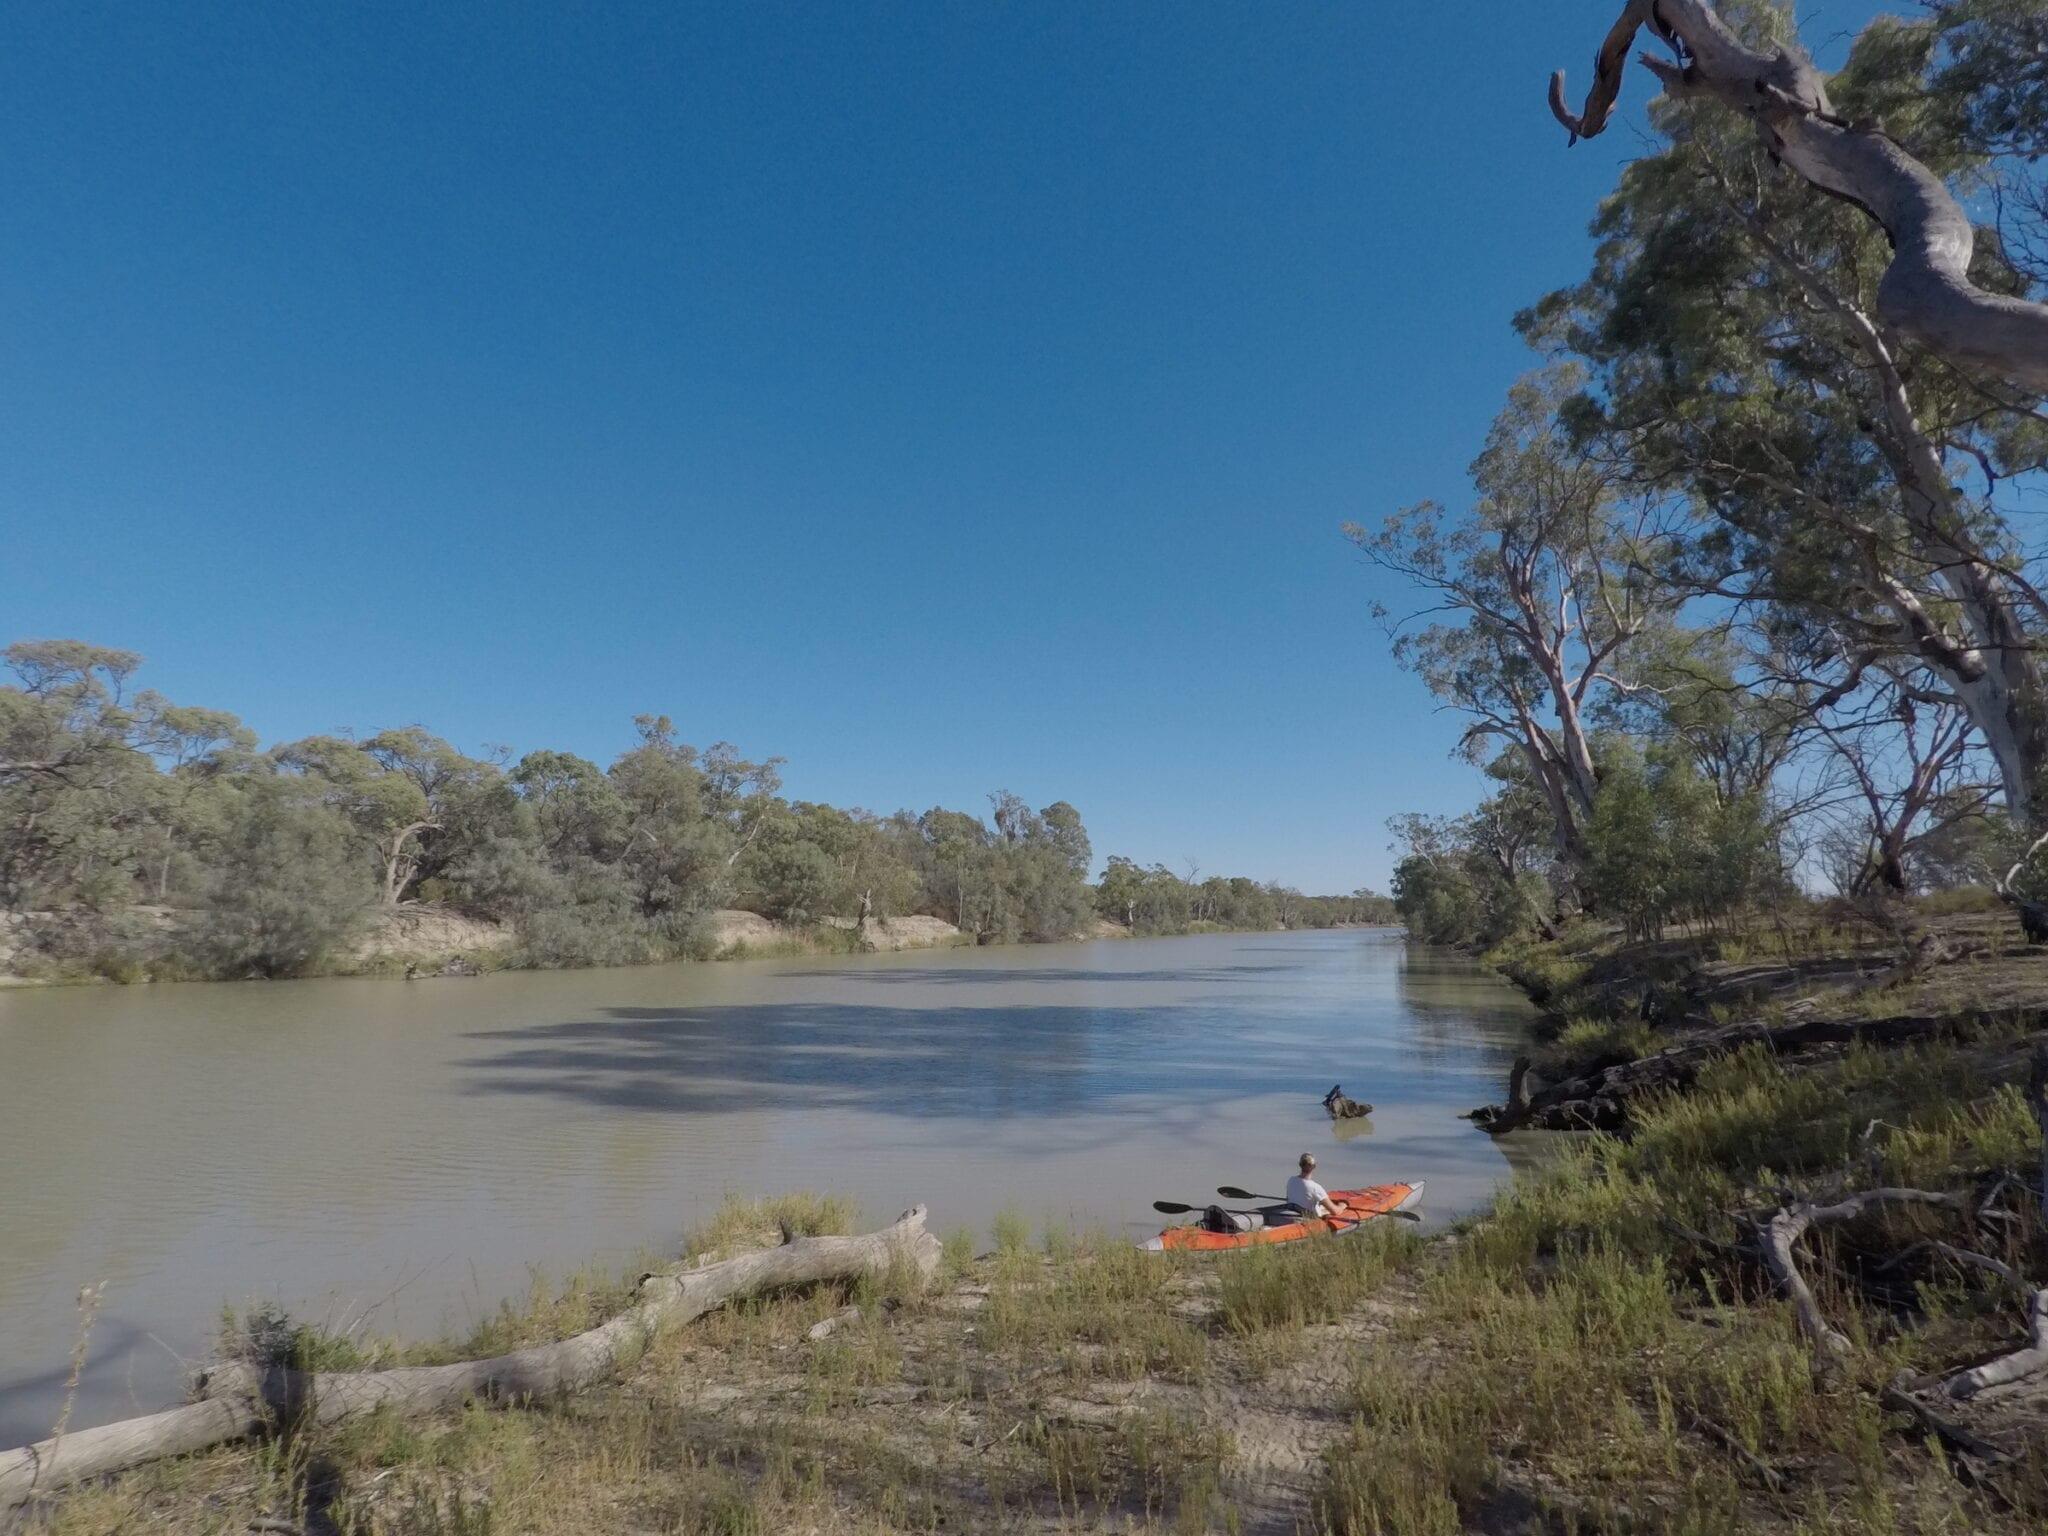 Kayaking The Murray River, looking upstream.